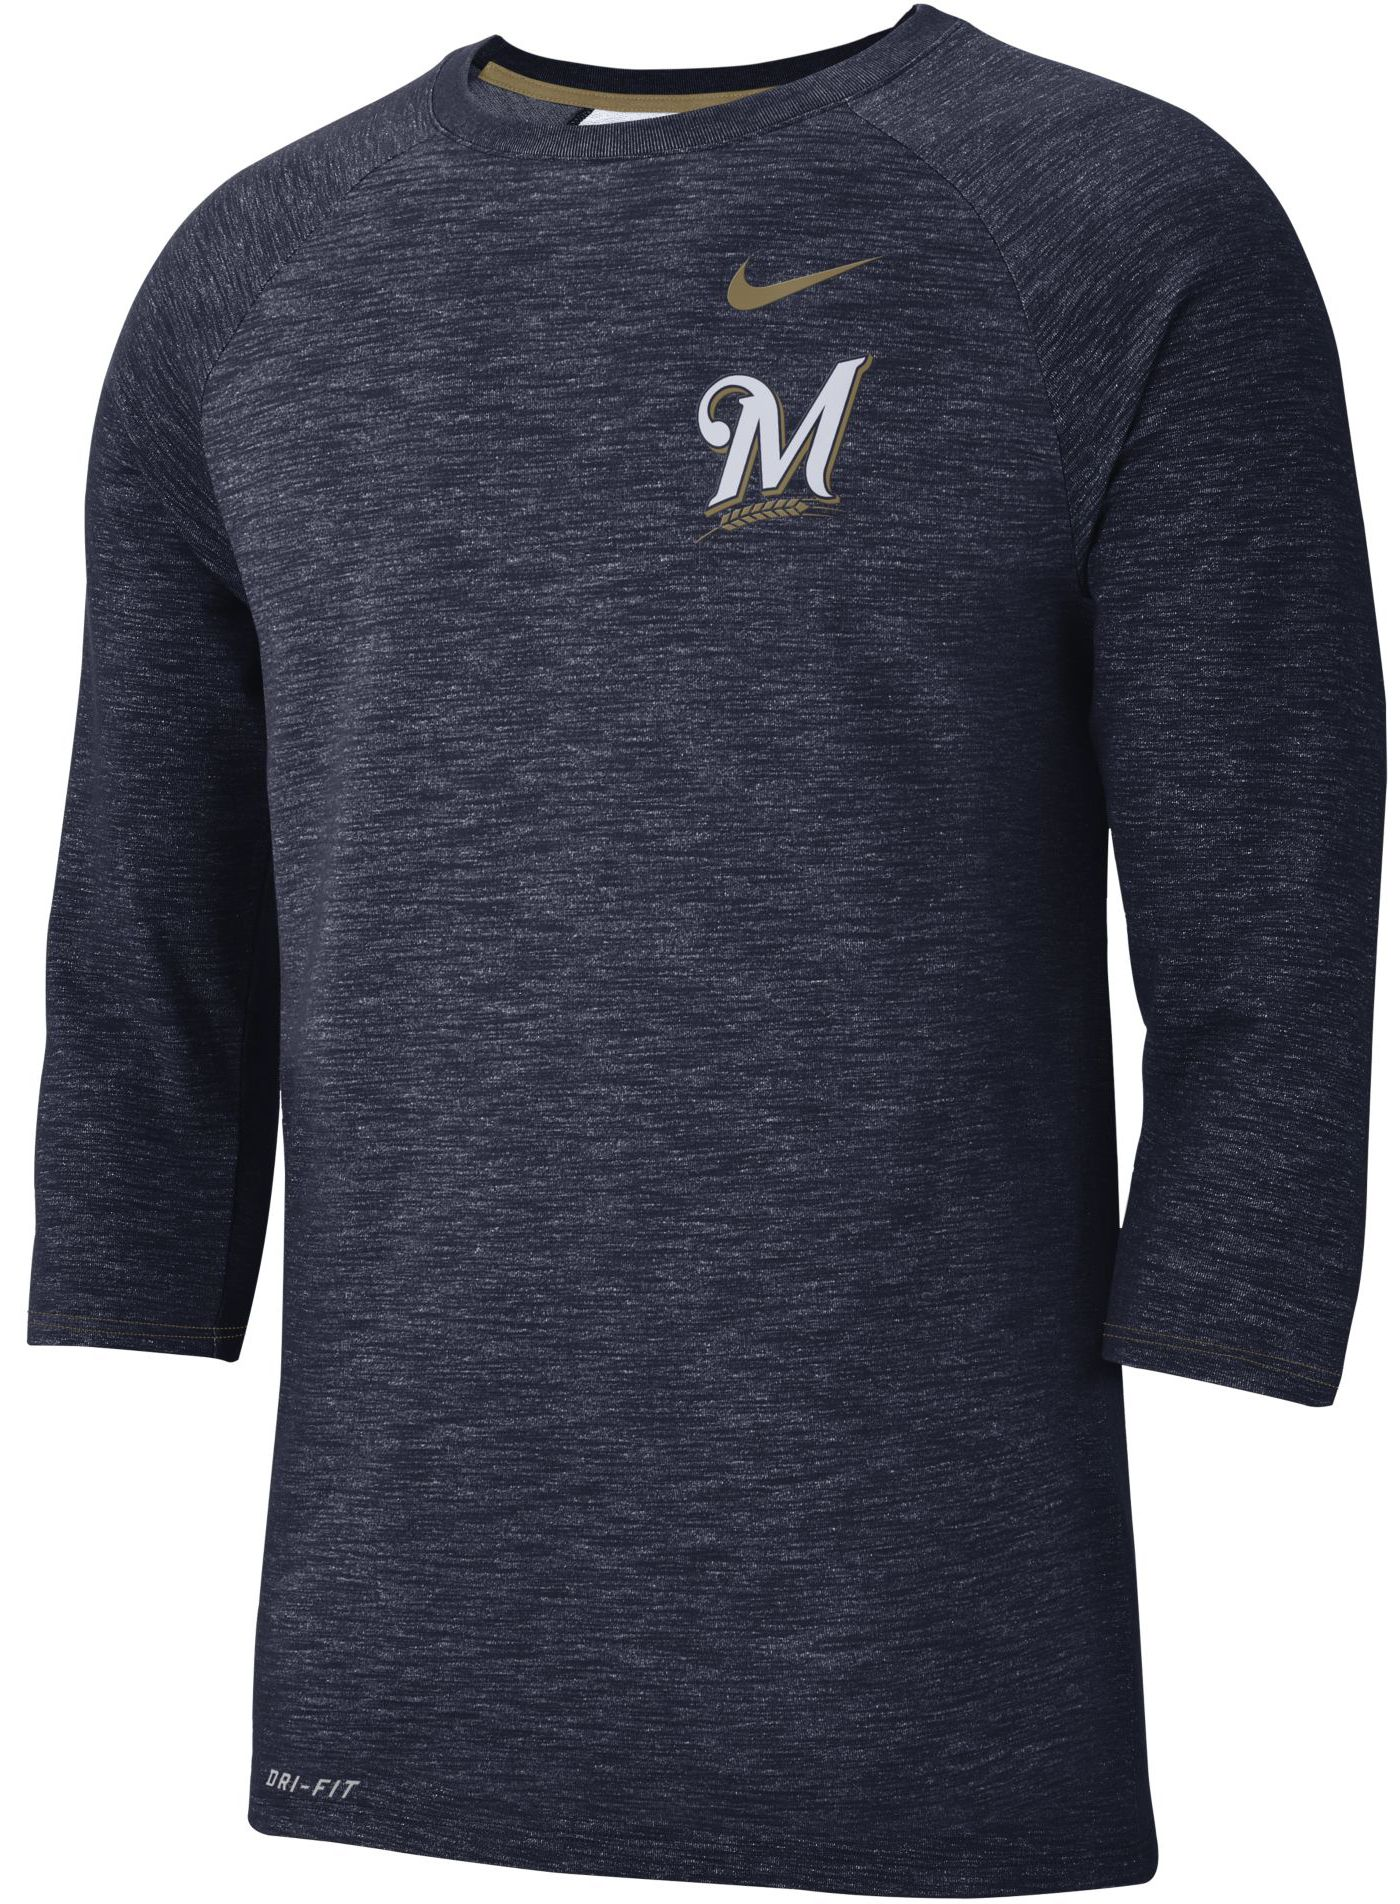 Nike Men's Milwaukee Brewers Dri-FIT Slub Three-Quarter Sleeve Shirt